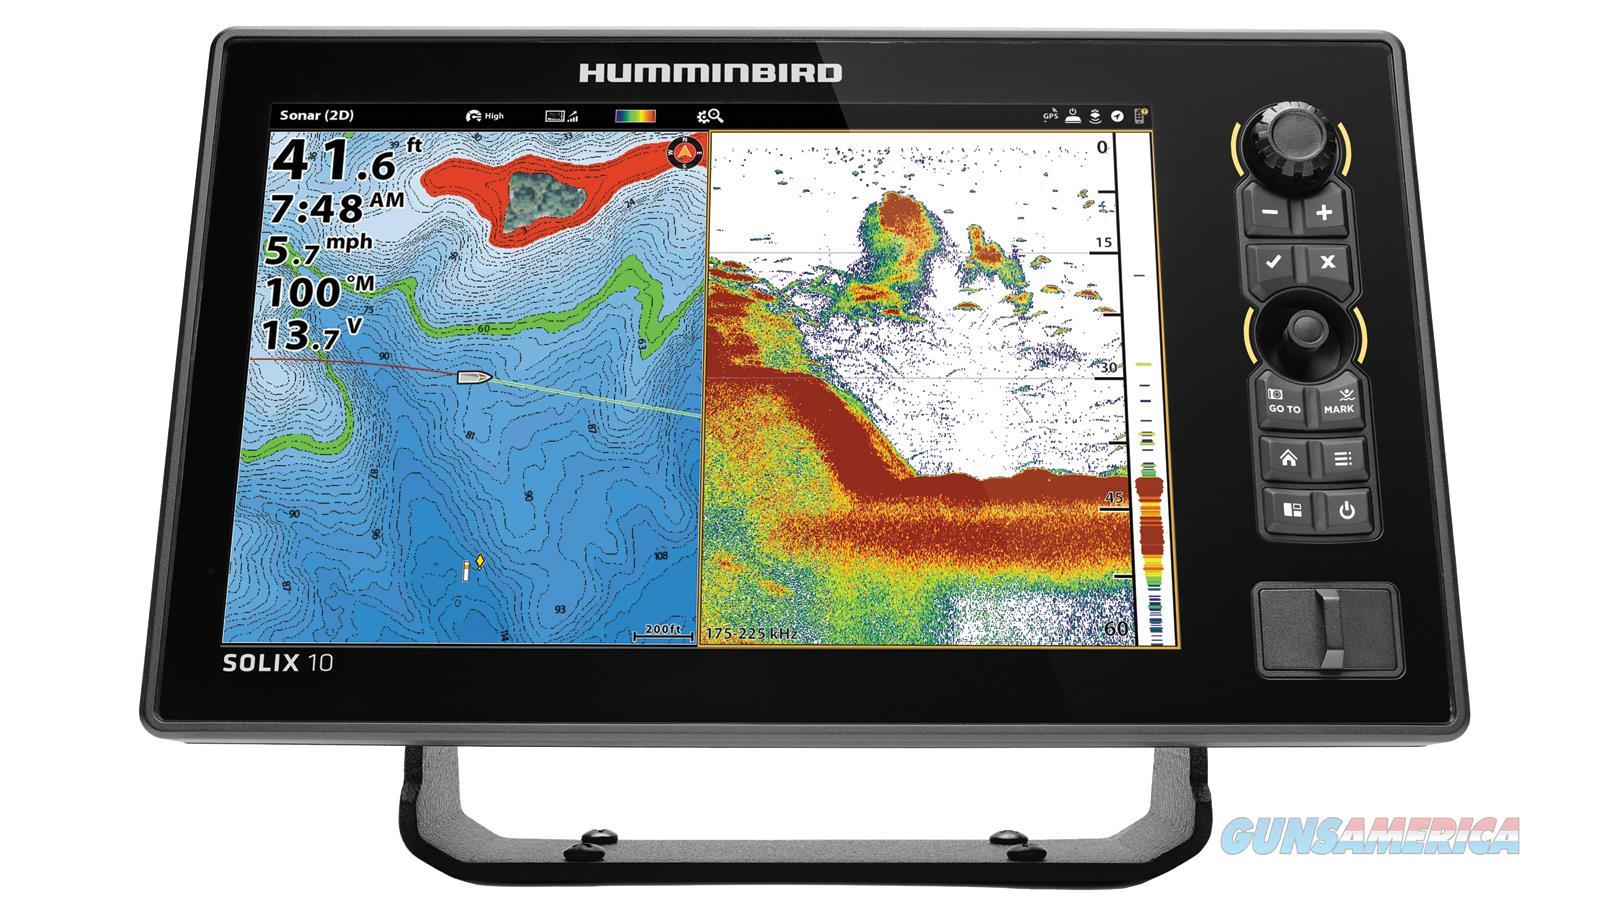 Humminbird Solix 10 Chirp Gps 410470-1  Non-Guns > Fishing/Spearfishing